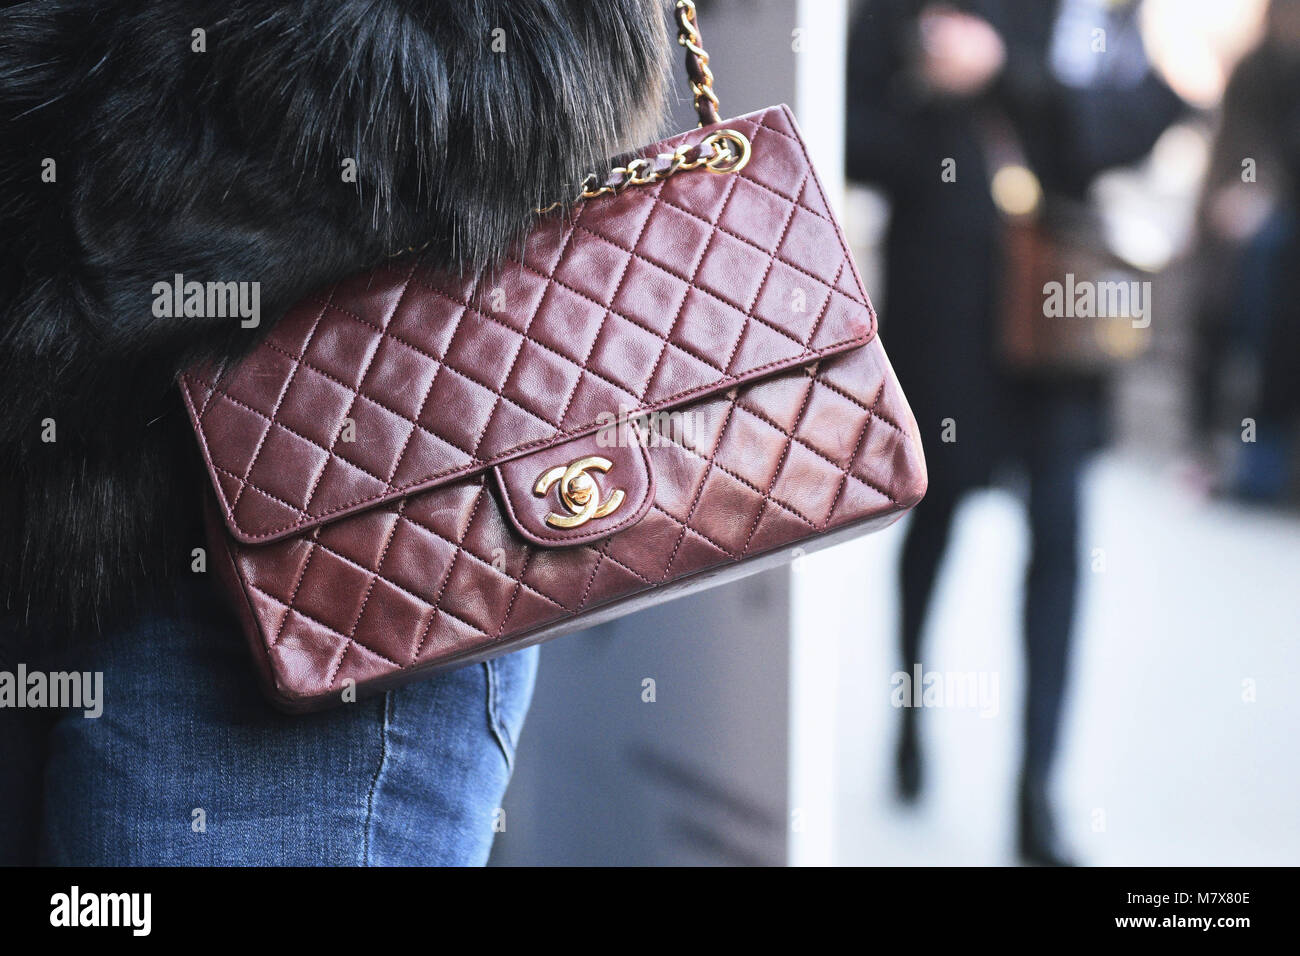 1195c0684fa6 Milan, Italy - February 21, 2018: Chanel bag in detail - fashion street